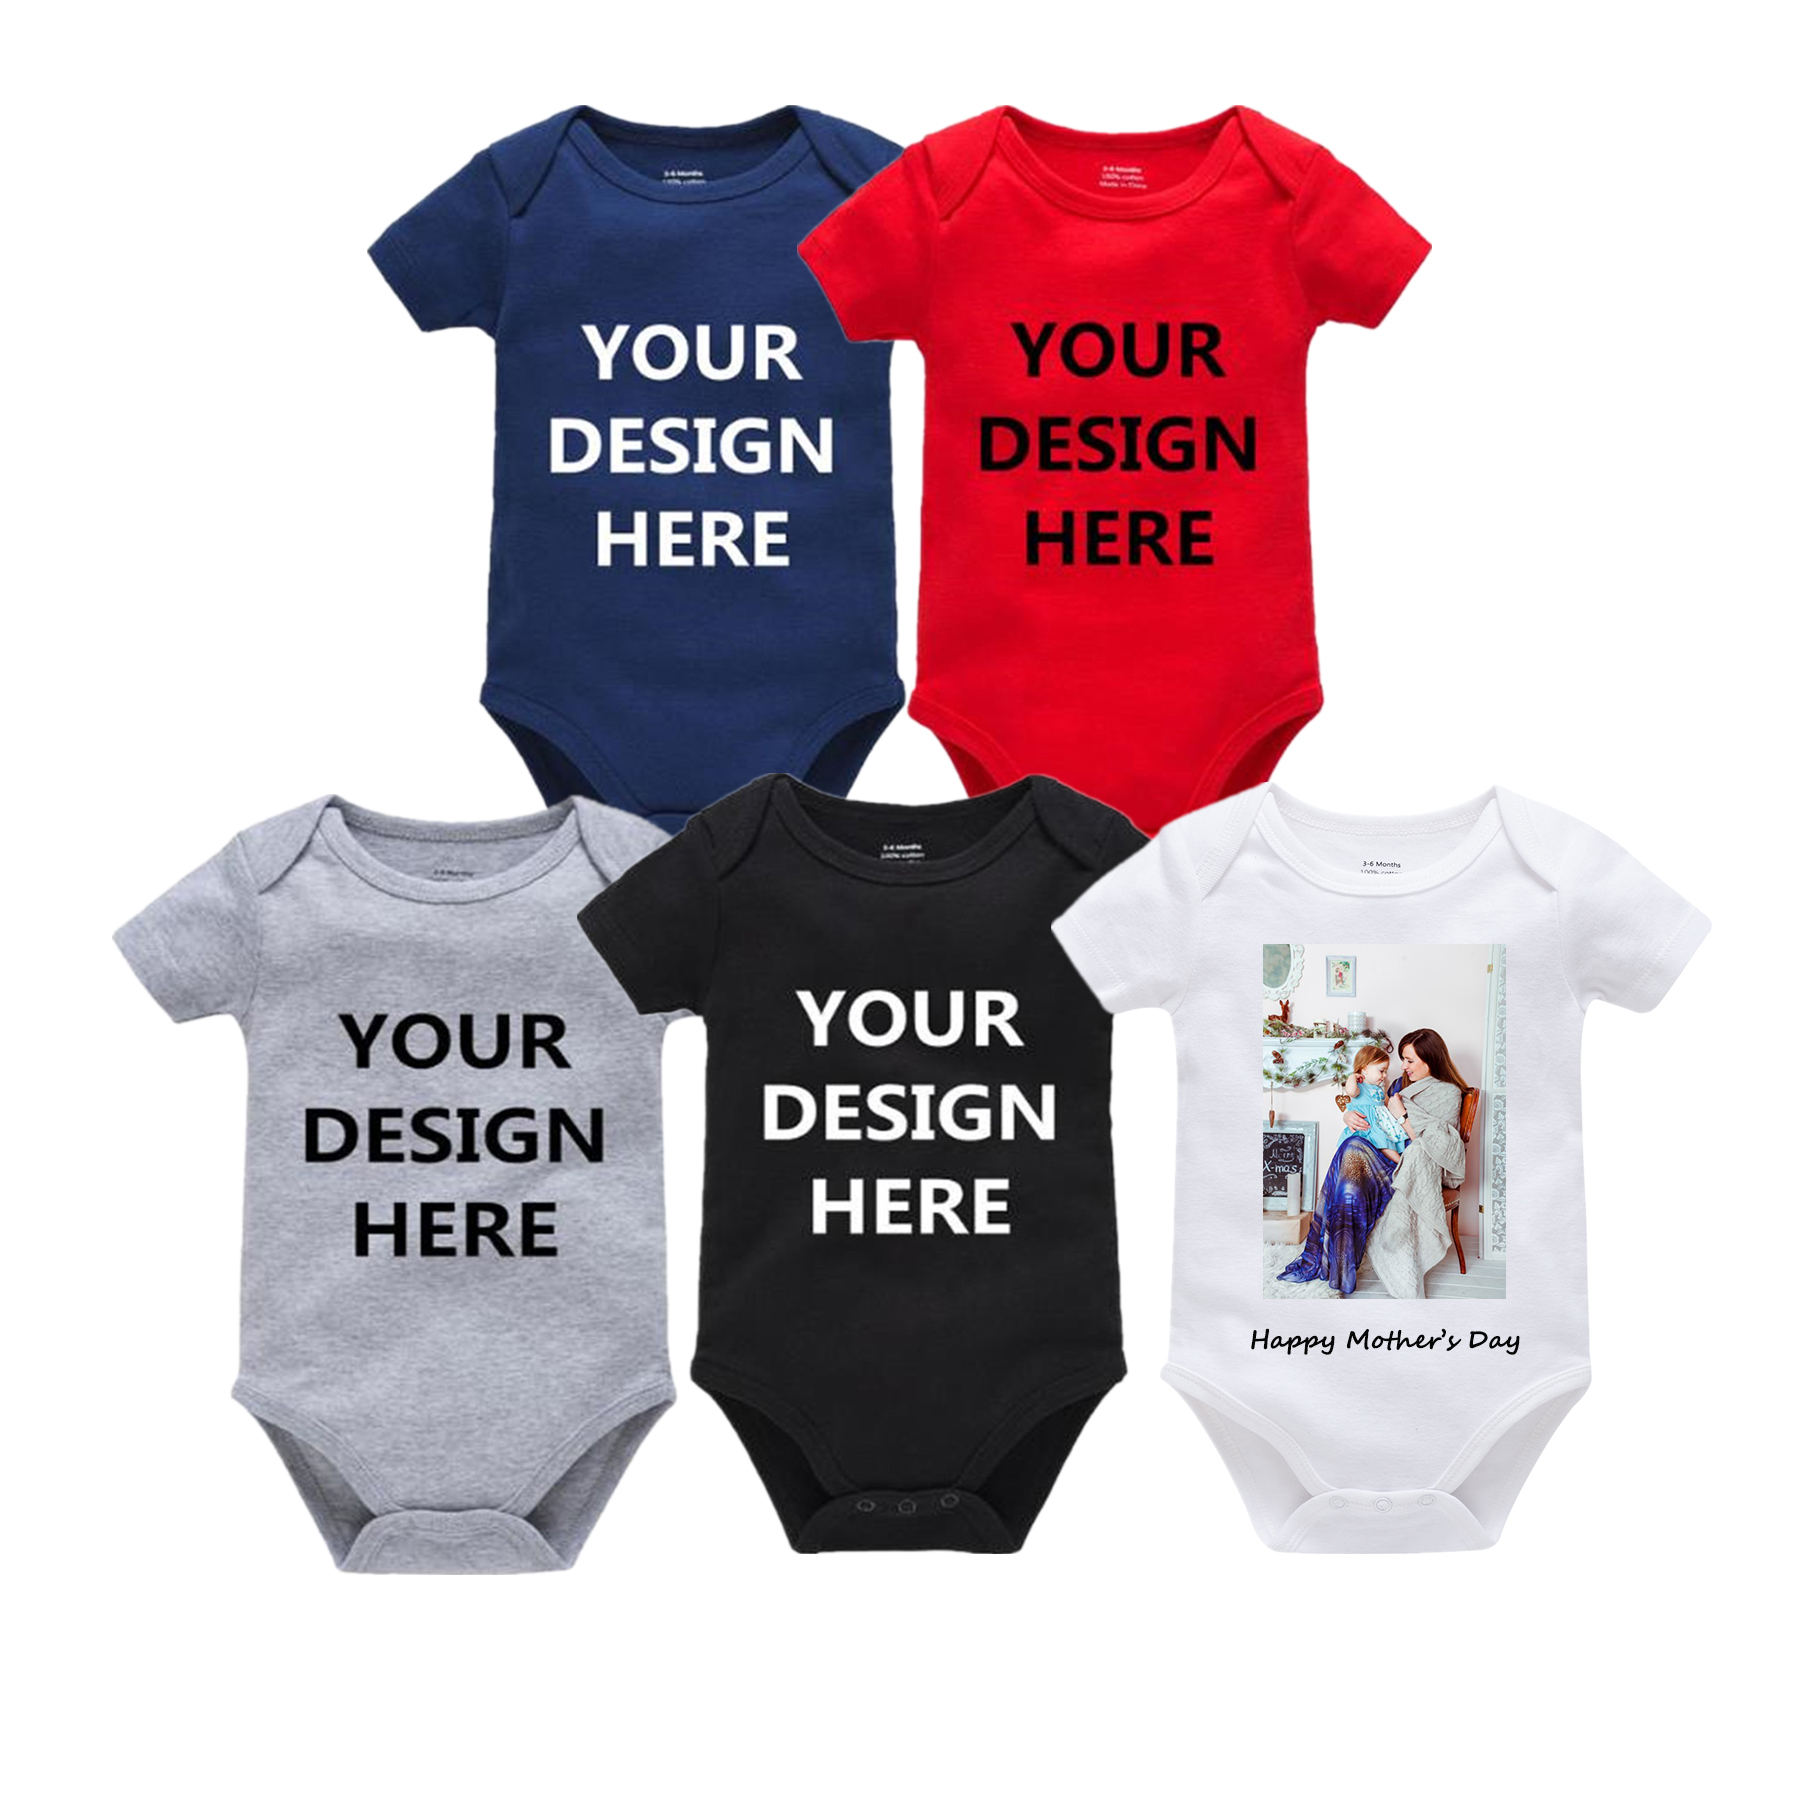 Bling Bling Ribbon Breast Cancer Awareness Unisex Toddler Baby 2-Piece Short-Sleeve Bodysuit Baby T-Shirt Set